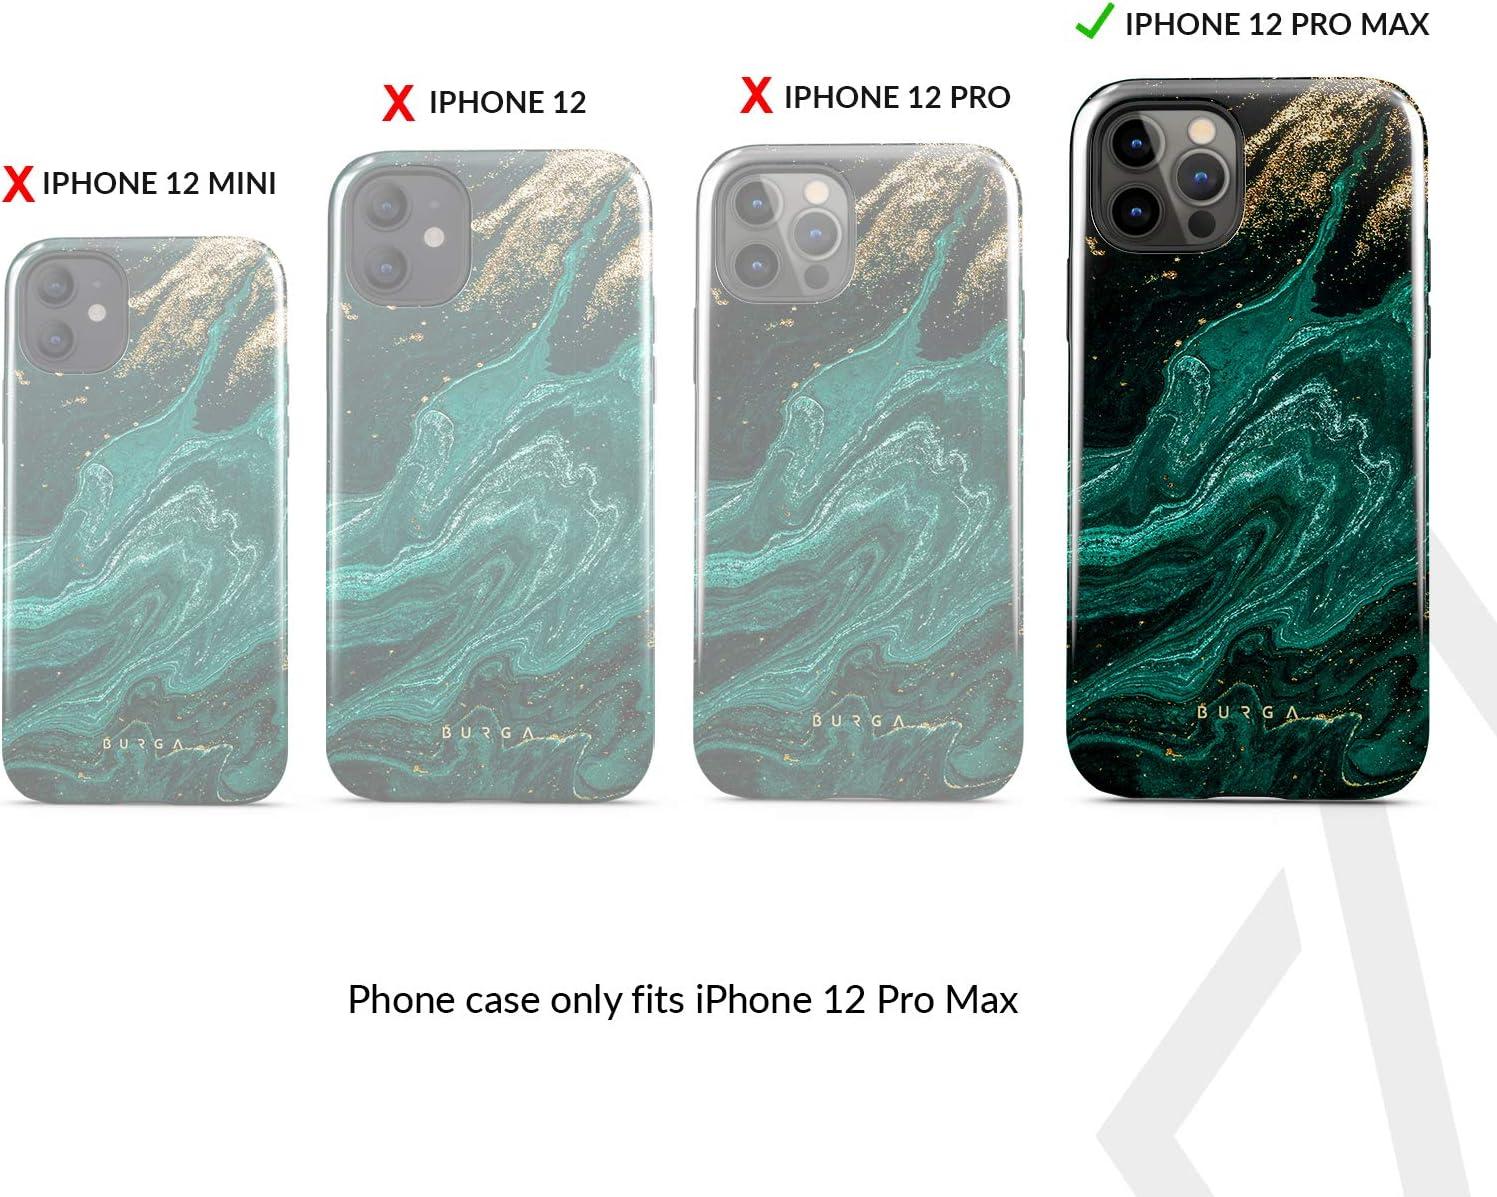 Burga Hülle Kompatibel Mit Iphone 12 Pro Max Handy Elektronik